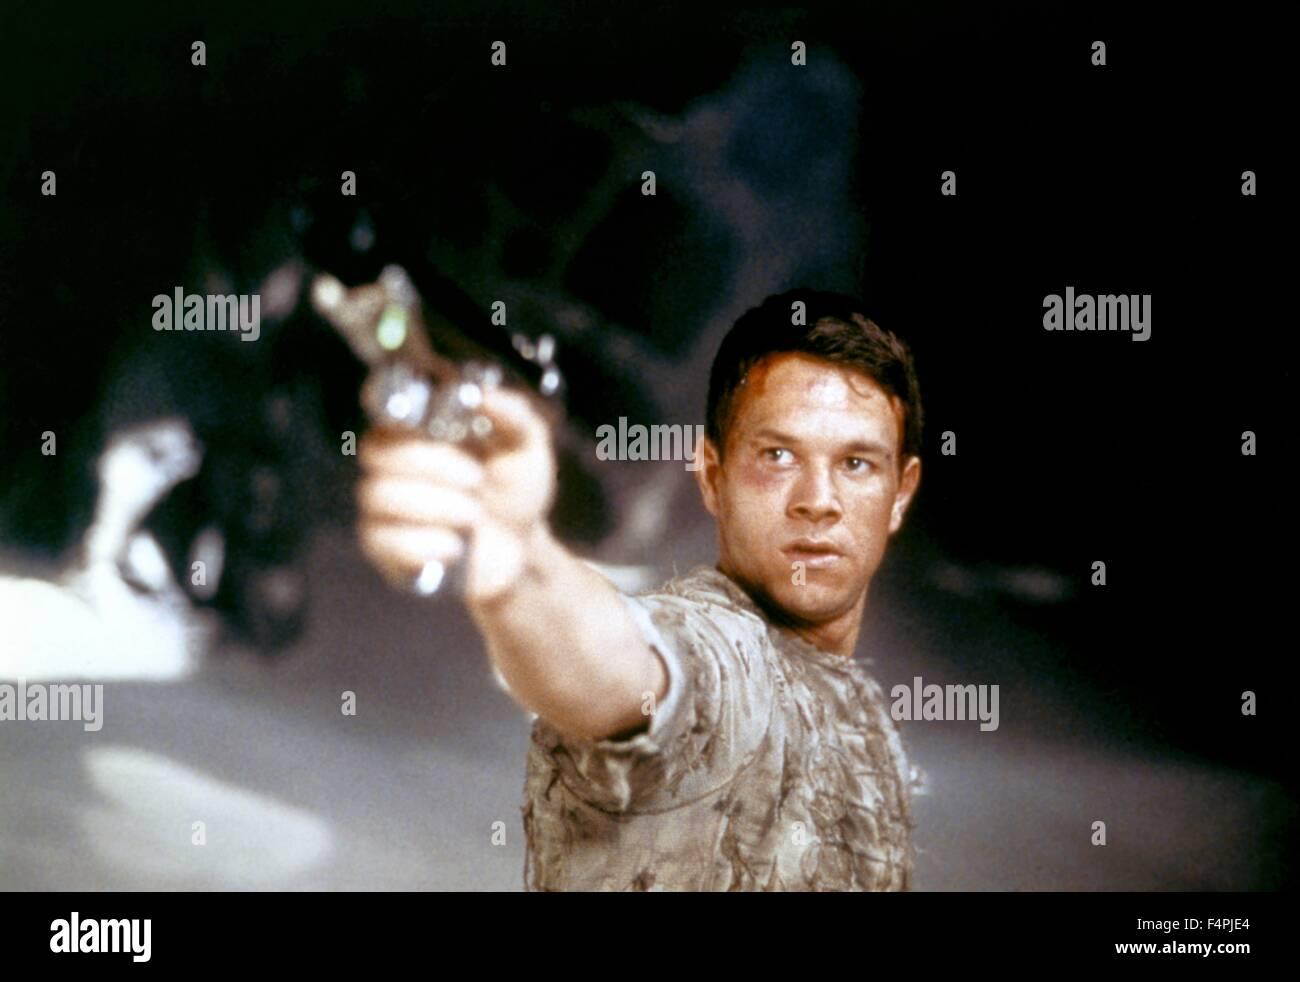 Mark Wahlberg / Planet of the Apes / 2001 directed by Tim Burton [Twentieth Century Fox Film Corpo] - Stock Image